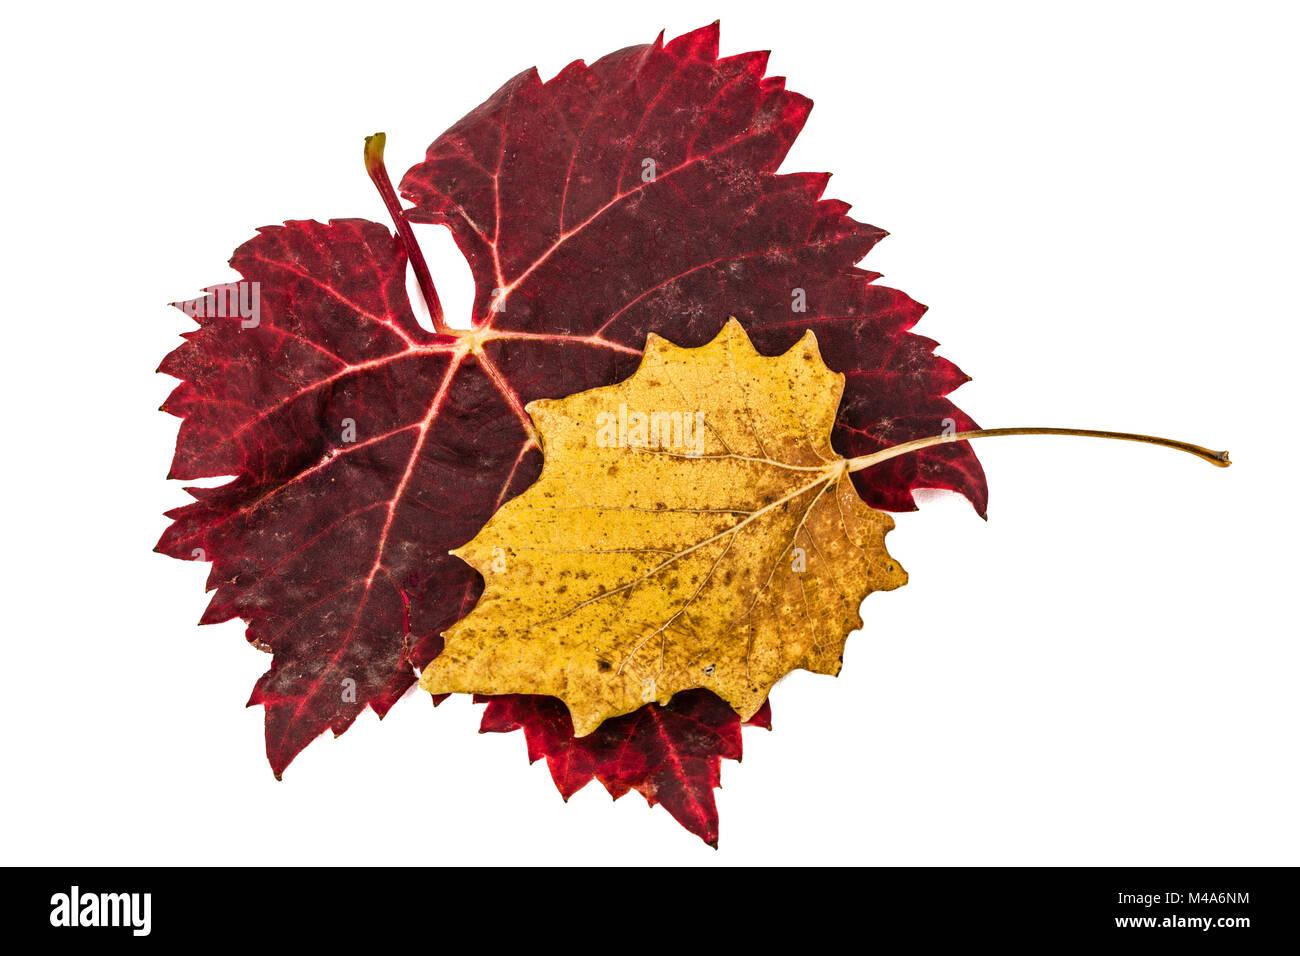 Fallen autumn leafs, isolated on white background Stock Photo